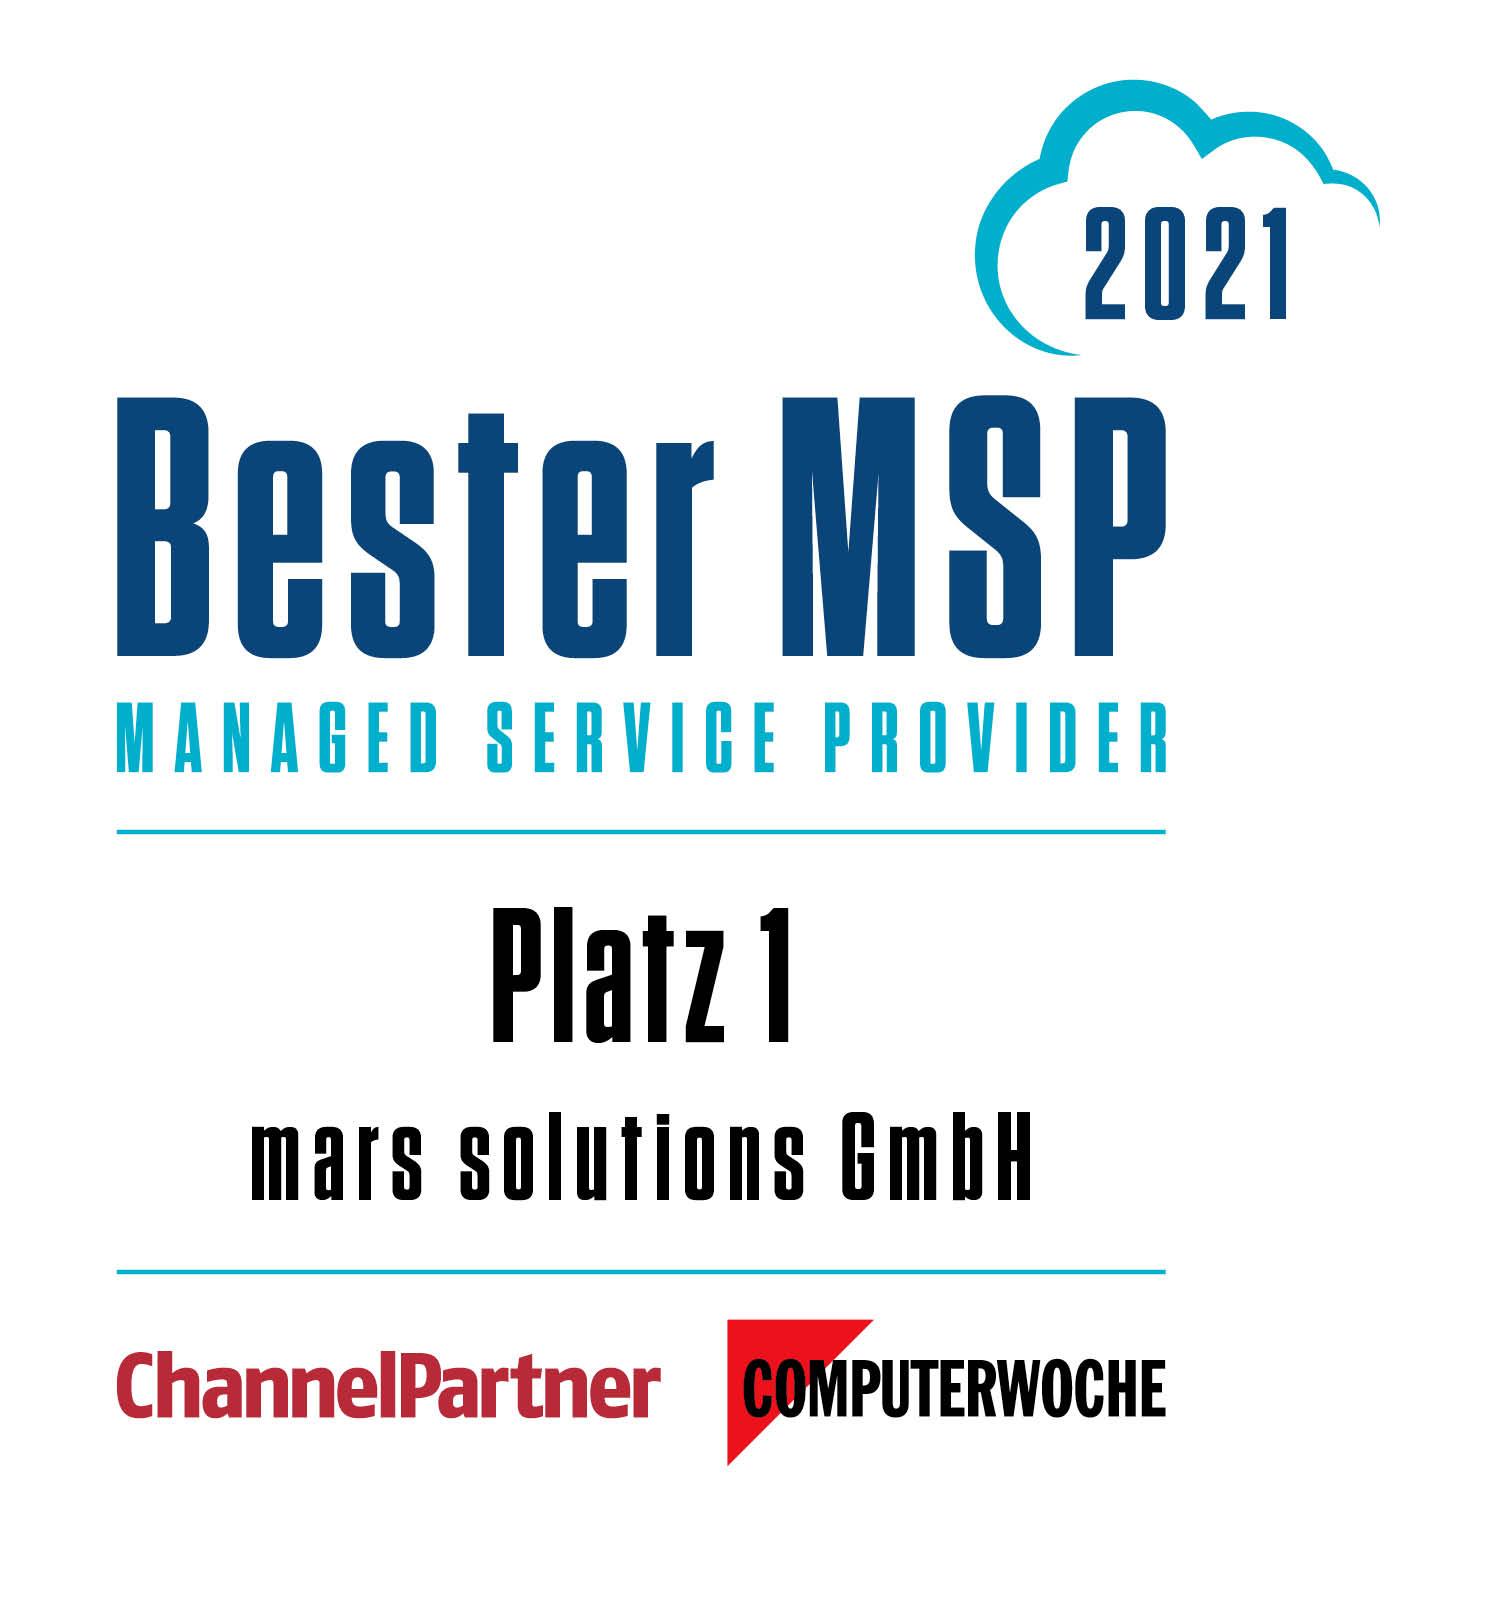 Bester Managed Service Provider 2019